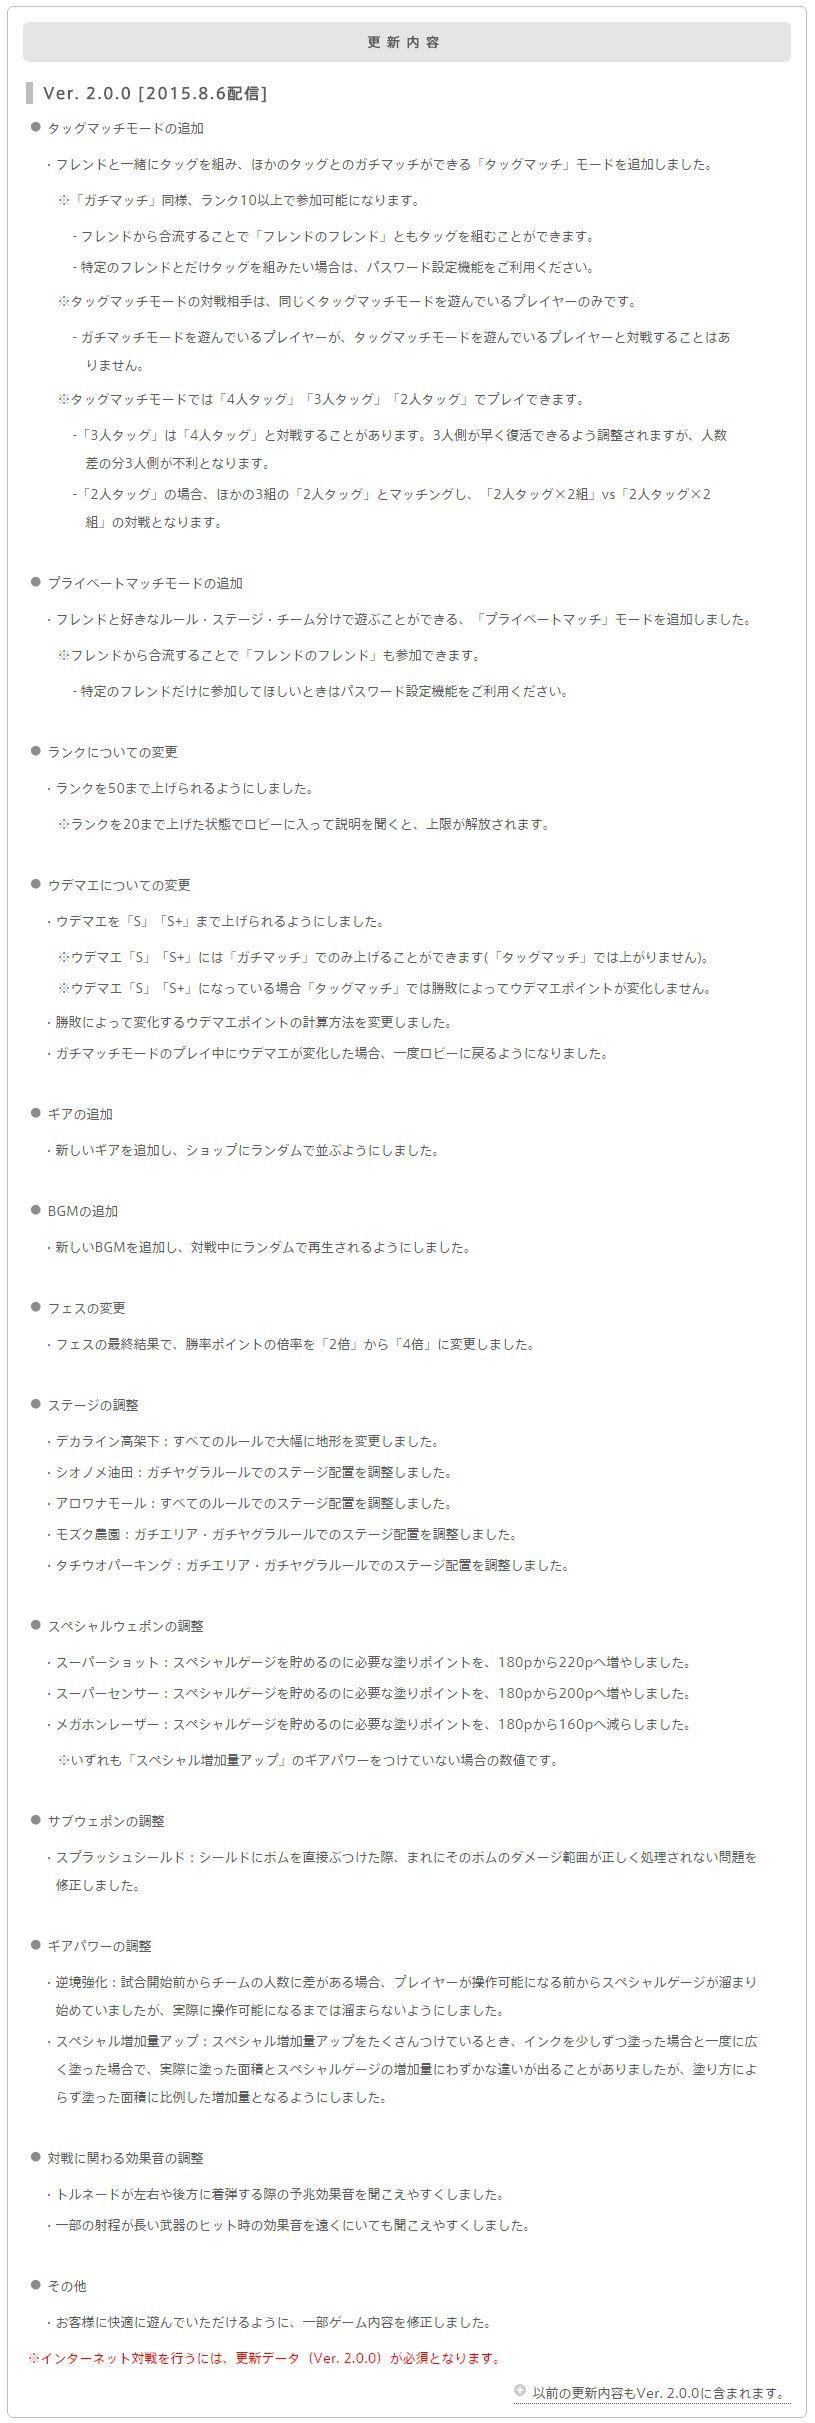 image_2705.jpg